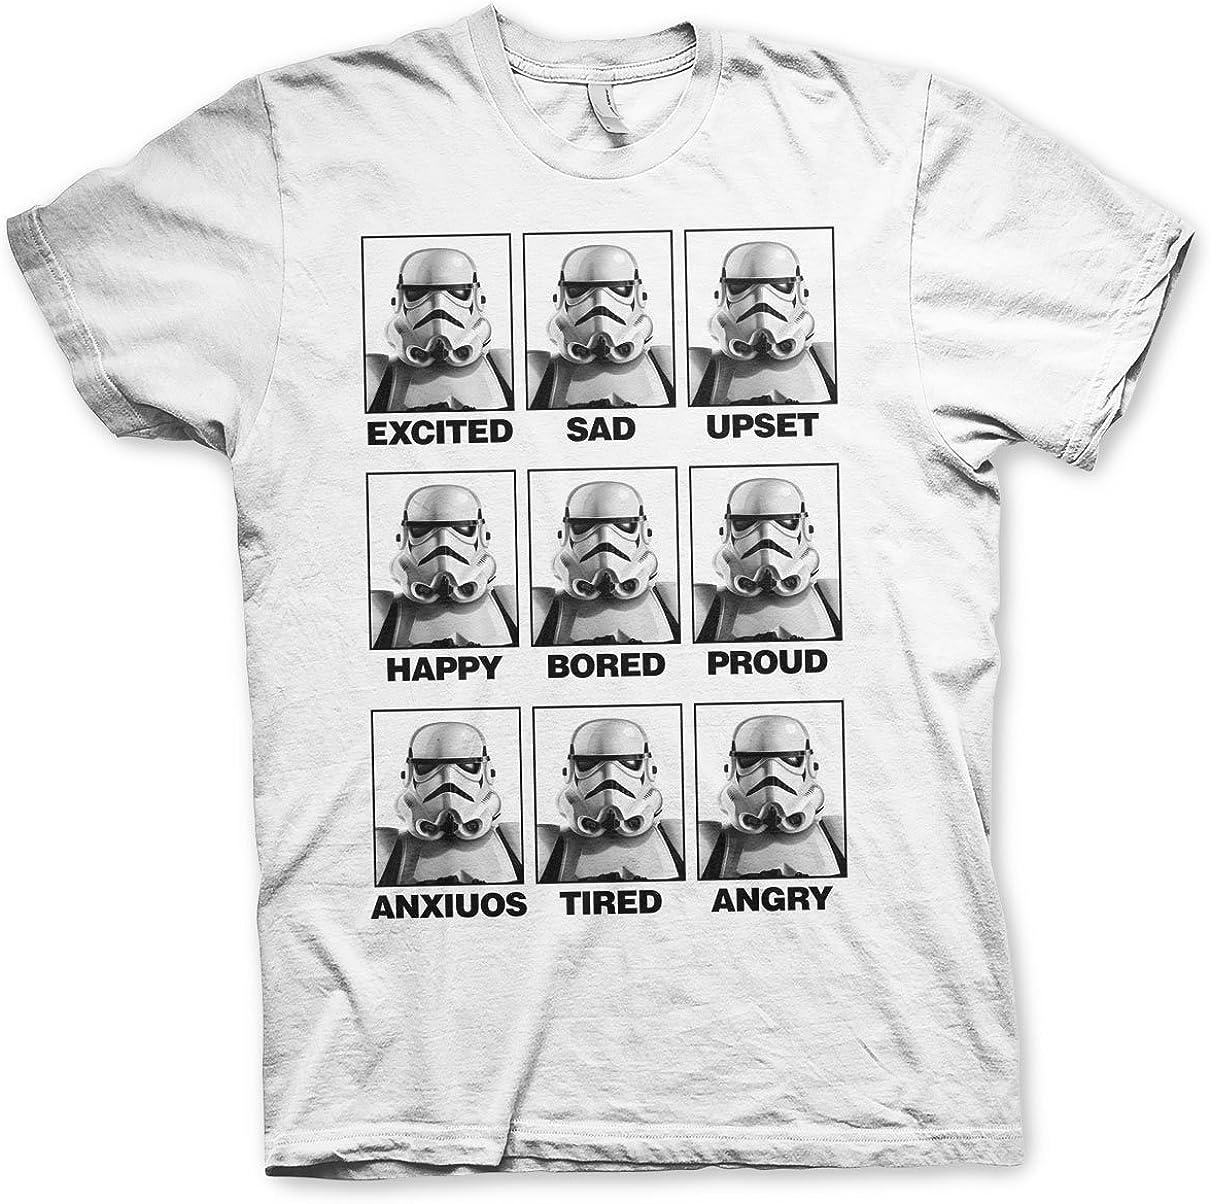 MEN/'S OFFICIAL MERCHANDISE Star Wars Storm Trooper County Jail t shirts